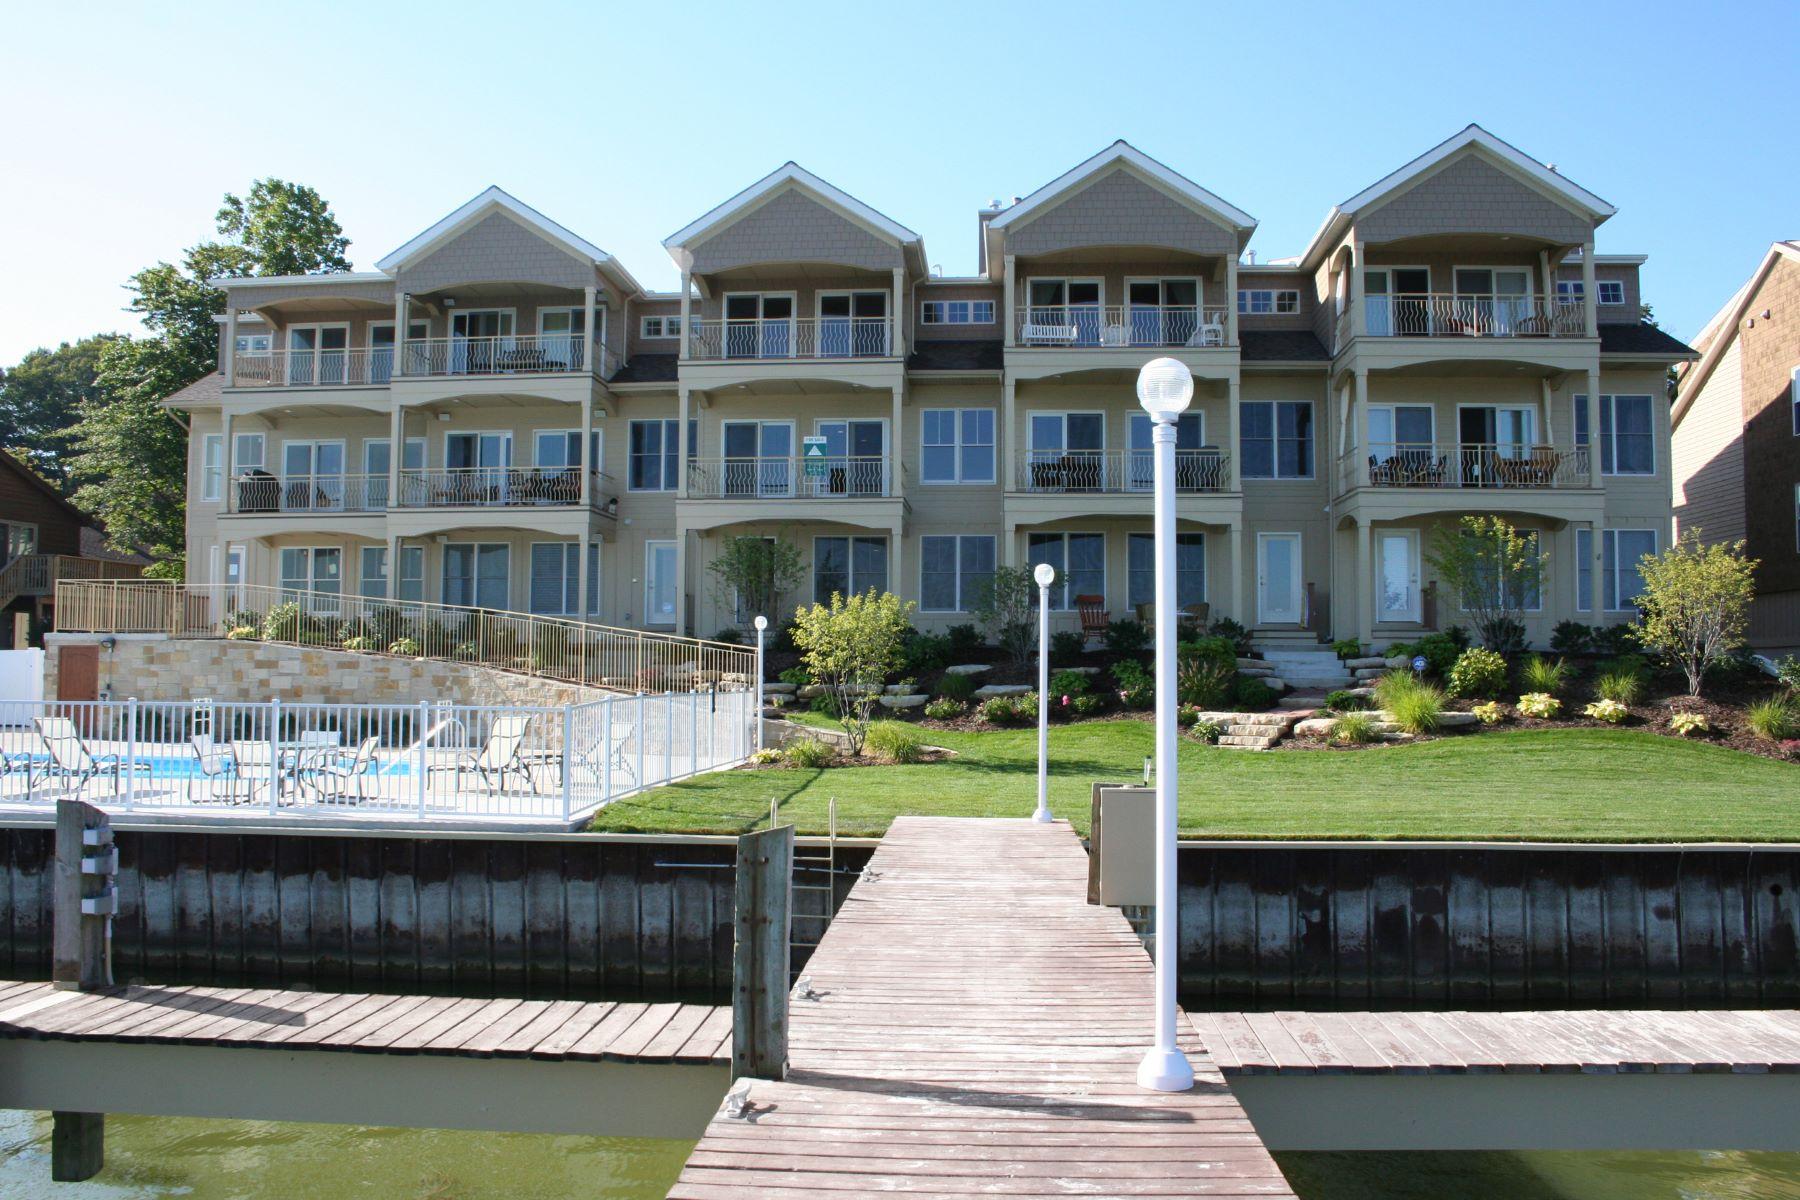 Nhà chung cư vì Bán tại Spacious And Inviting Waterfront Condominium 1647-5 South Shore Drive Holland, Michigan, 49423 Hoa Kỳ